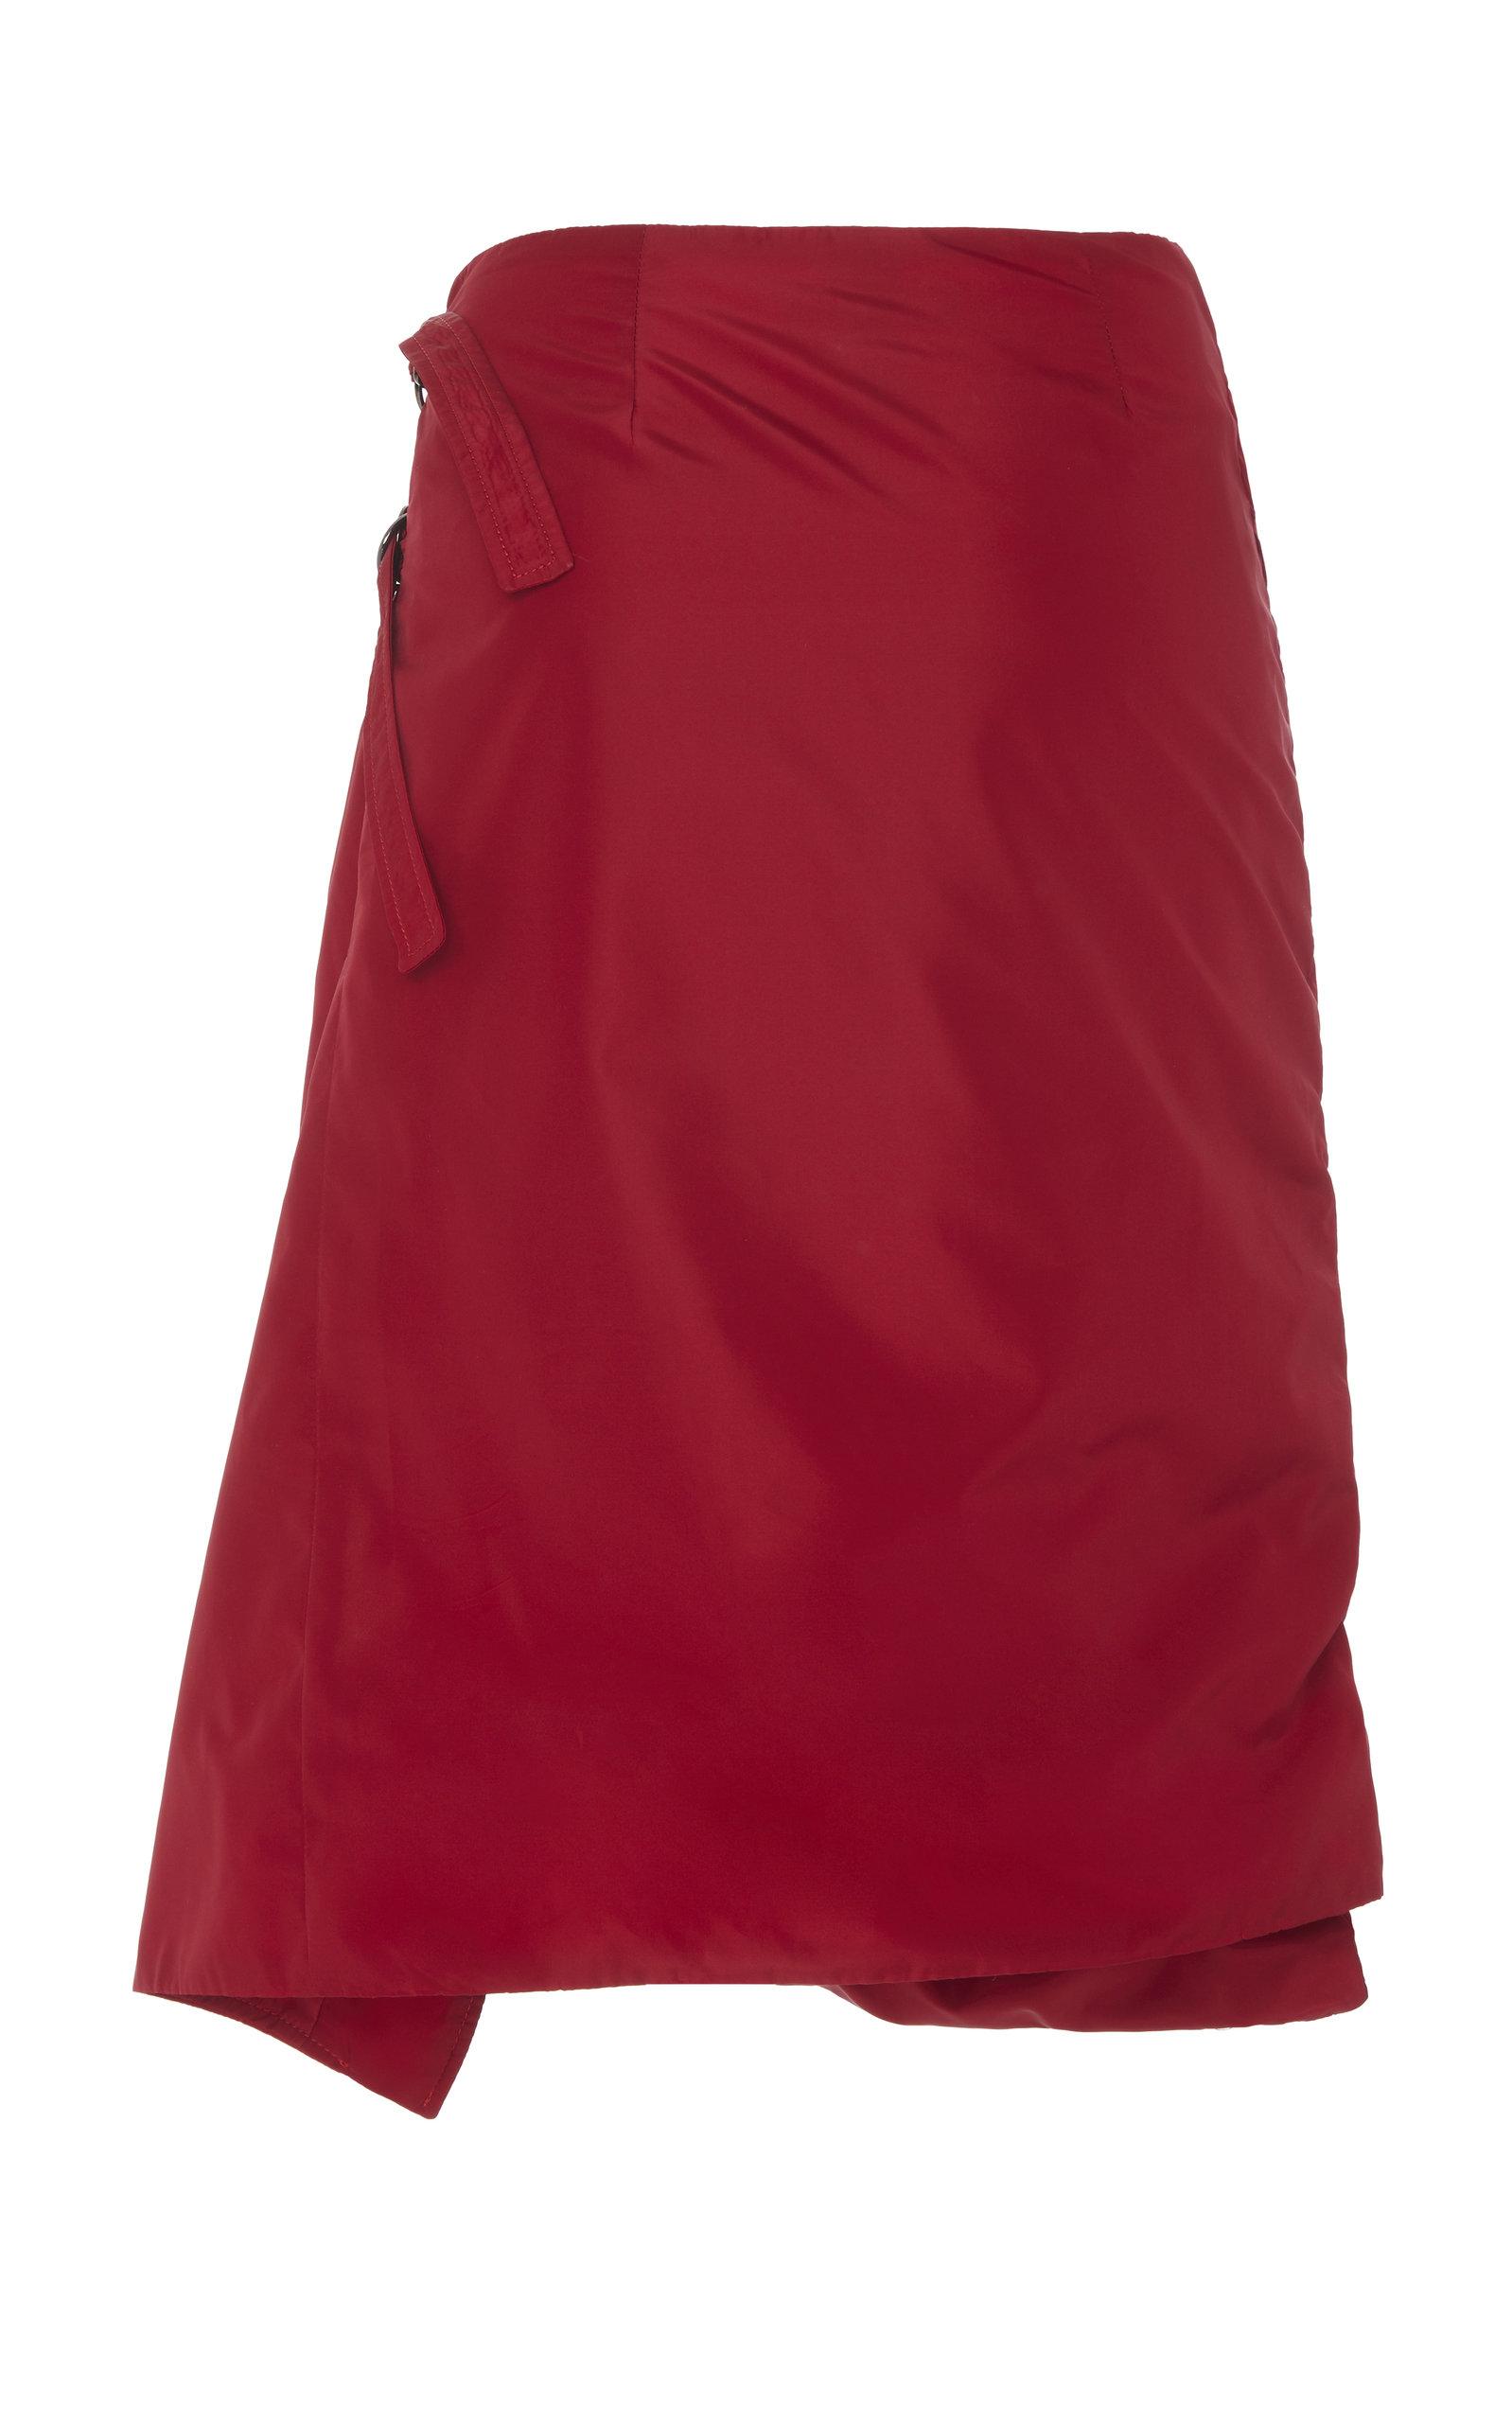 0a0b0f033c Pyer MossTufted Satin Wrap Skirt. CLOSE. Loading. Loading